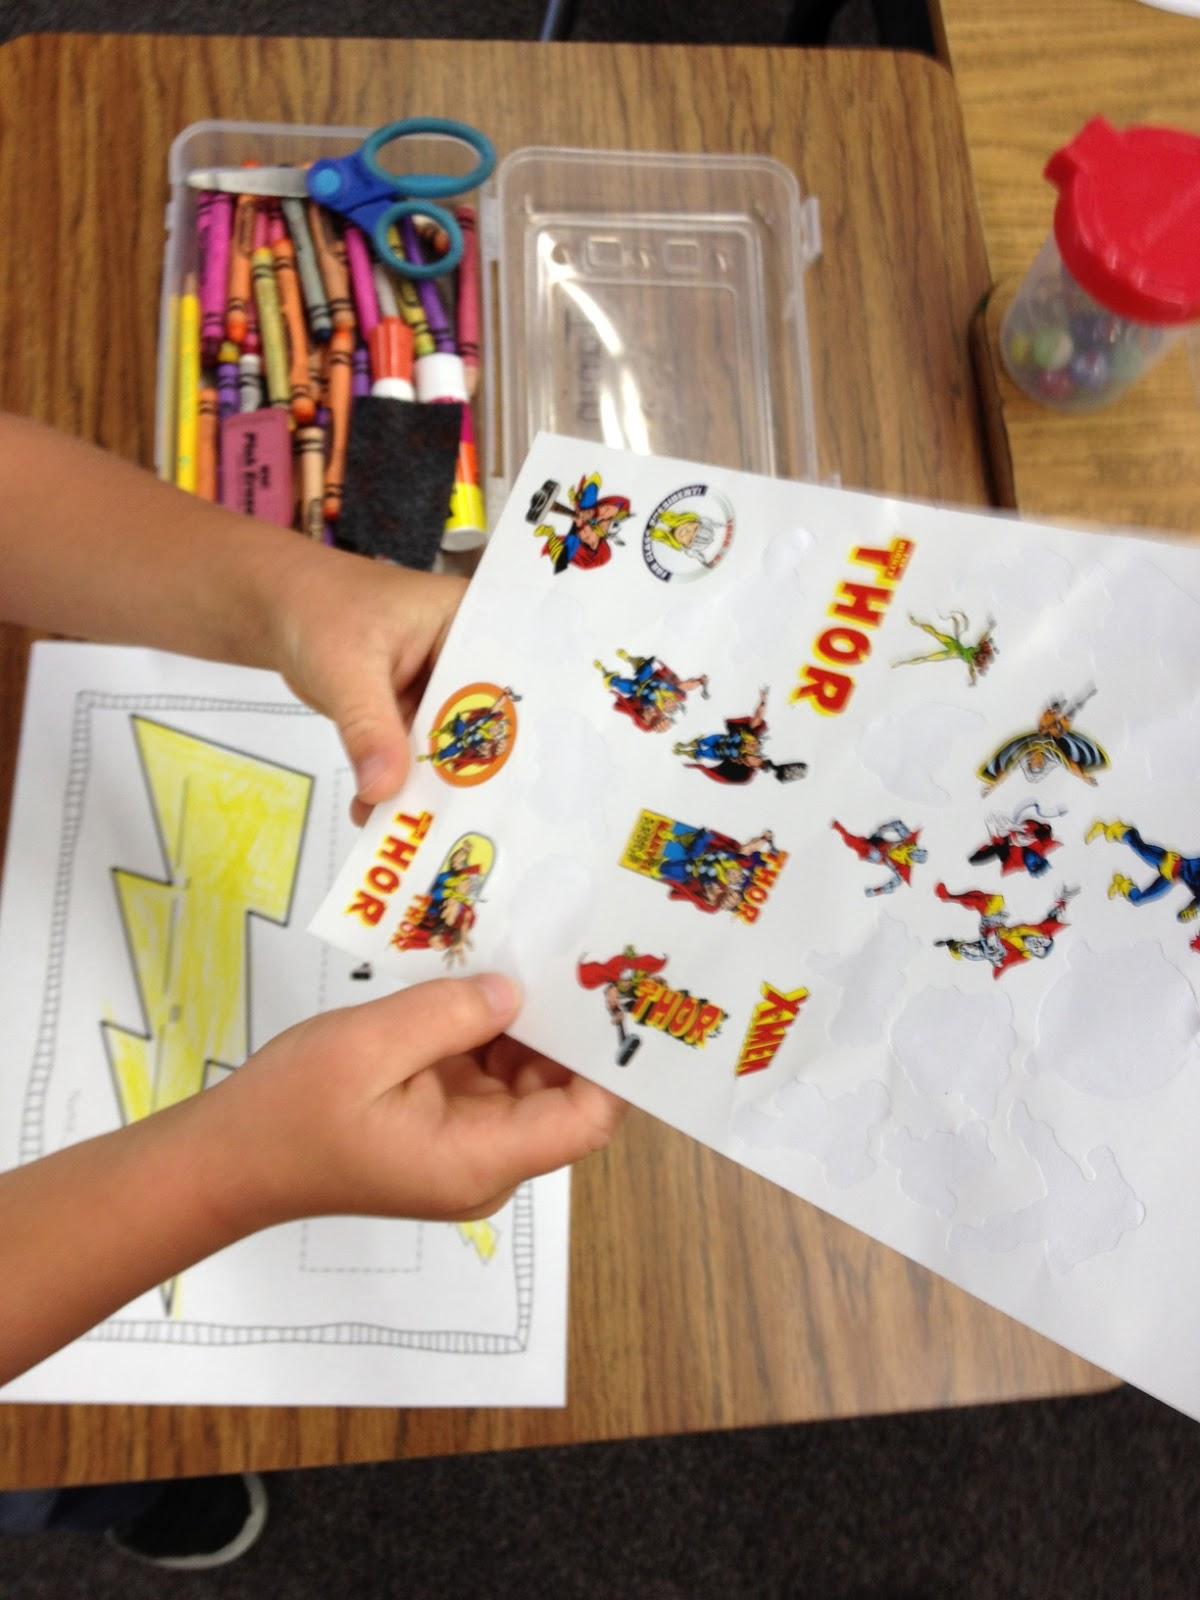 Superhero Subtraction And Building Words